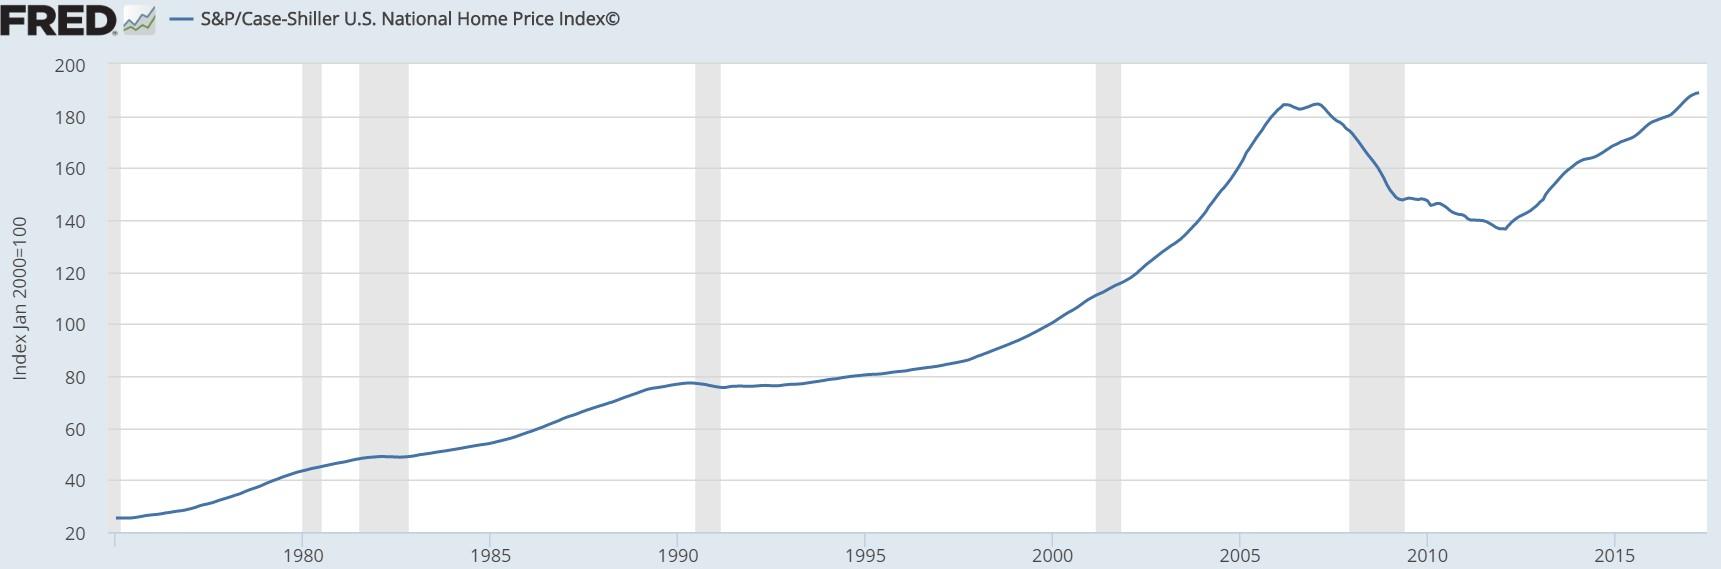 Case Shiller Housing Price Index